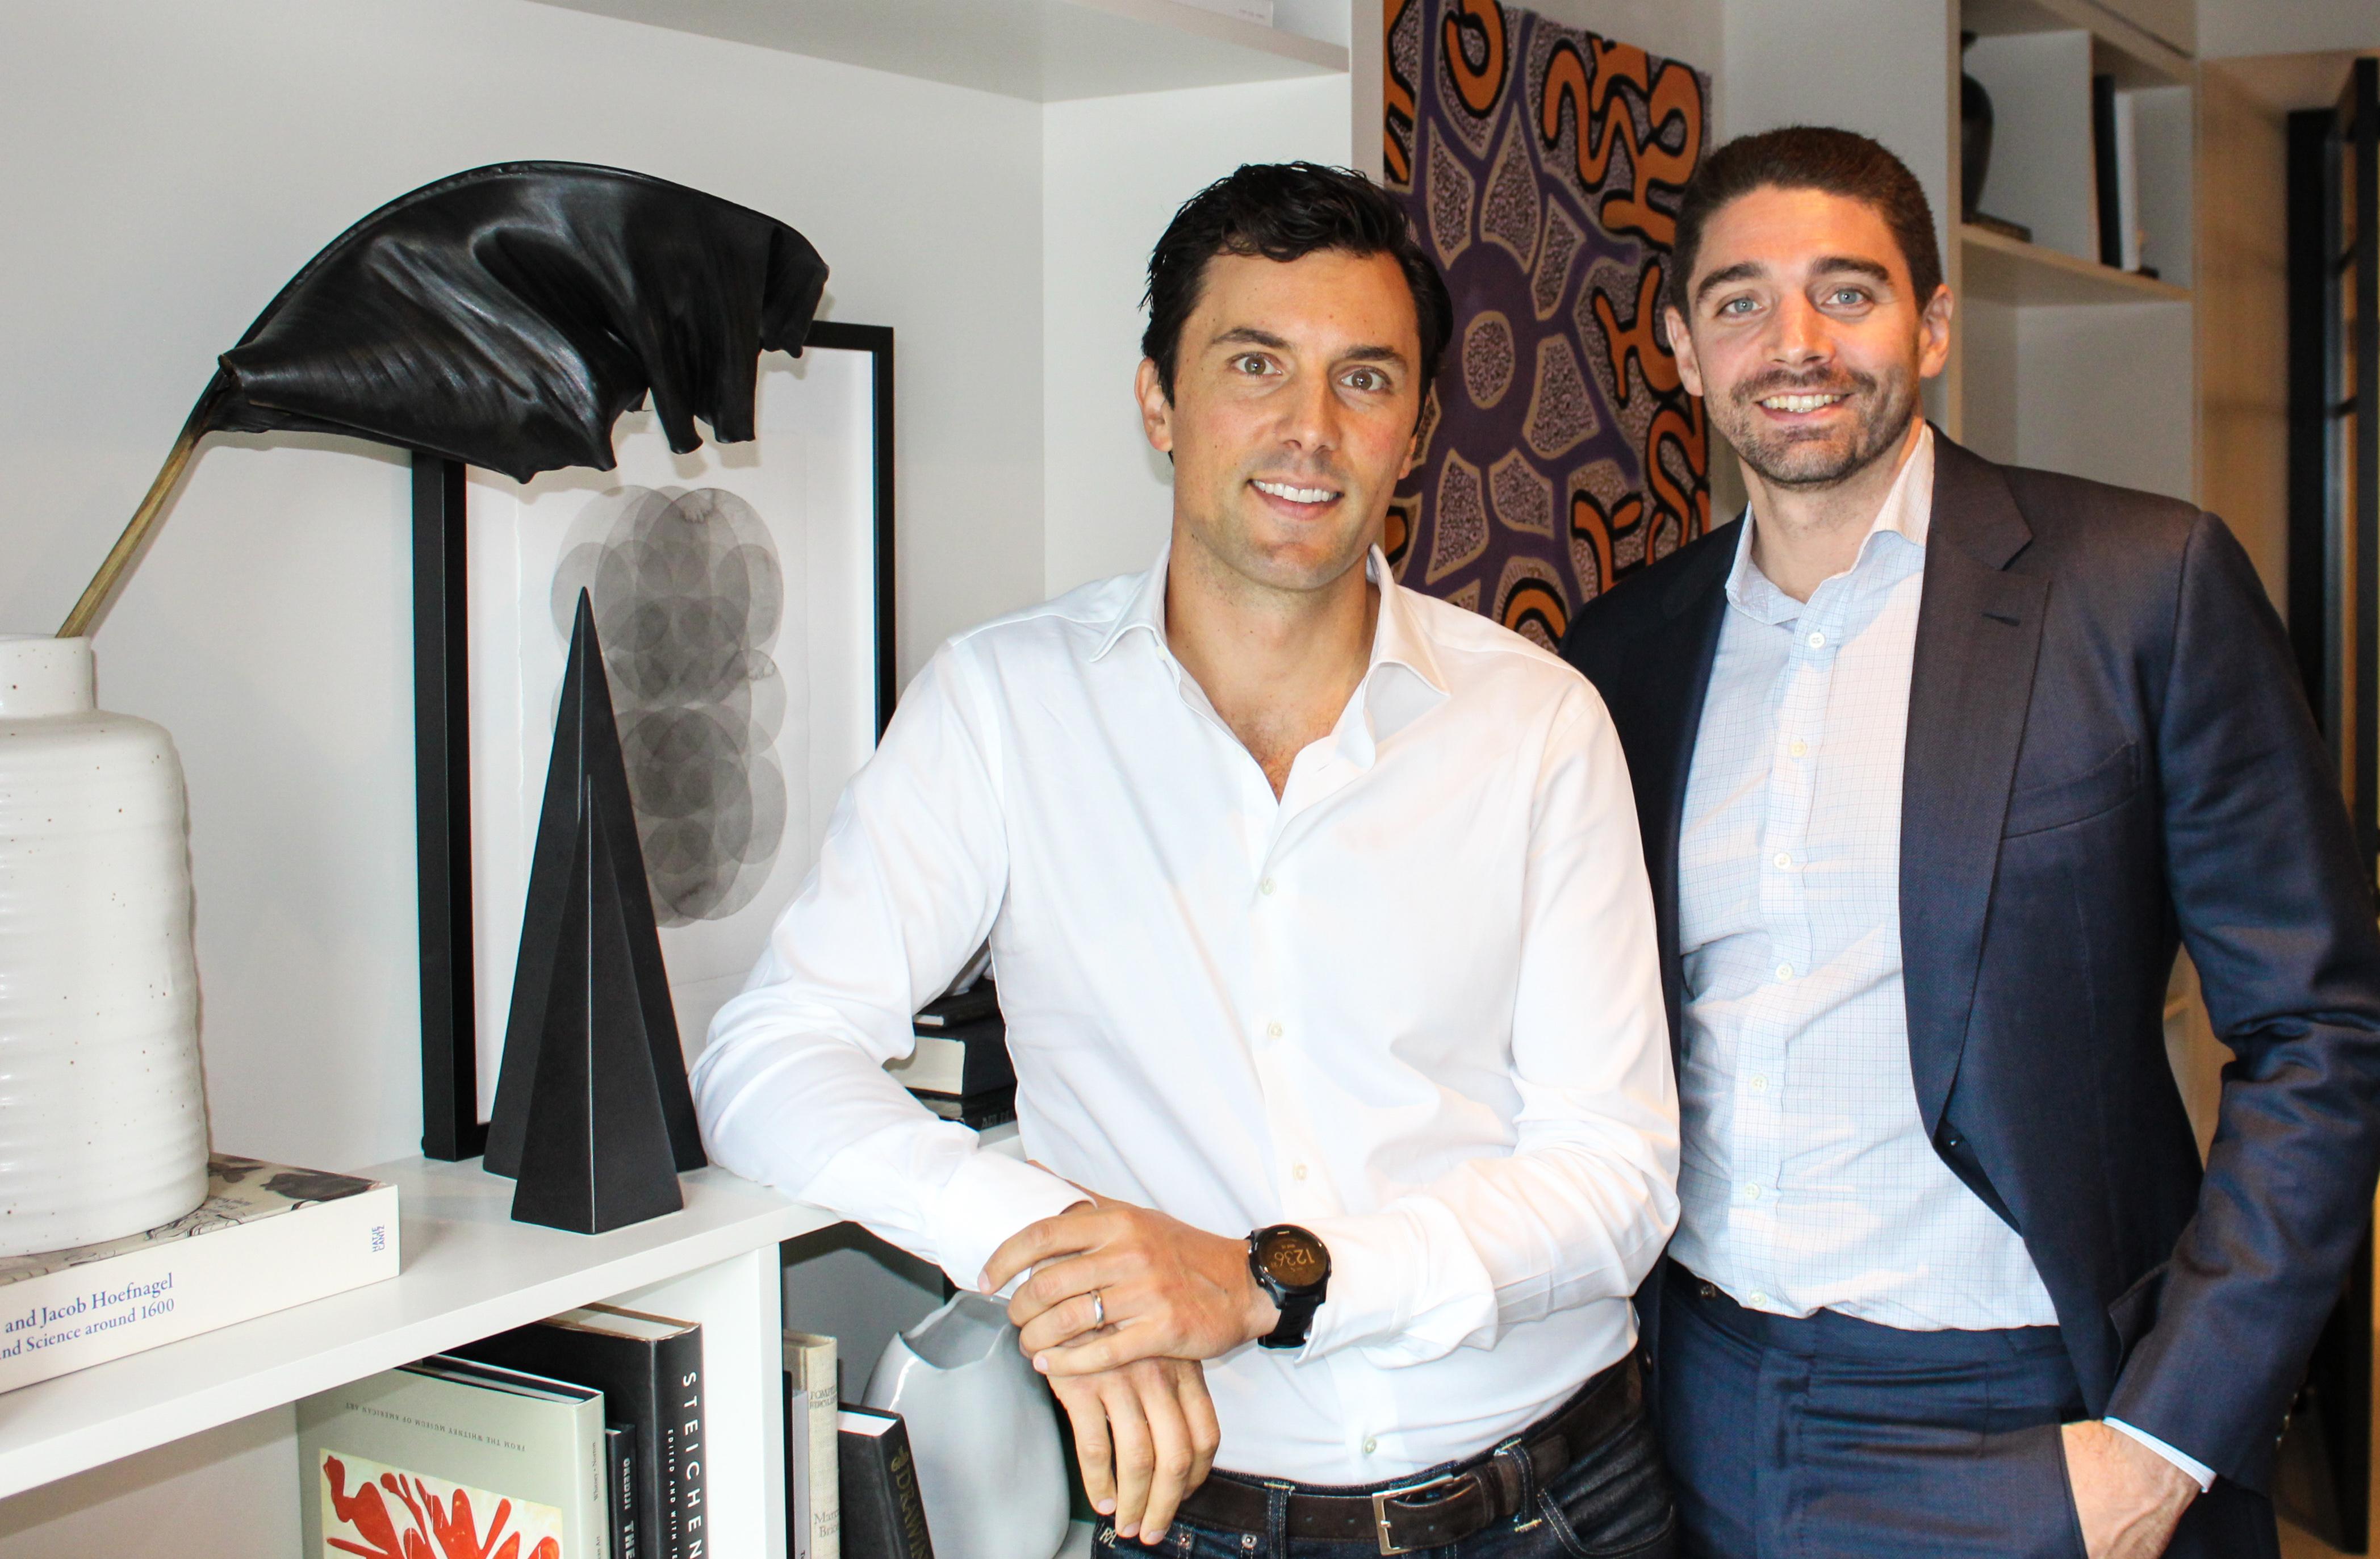 Convene uses landlord partnership model to outclass WeWork Ryan Chris 75 Rock